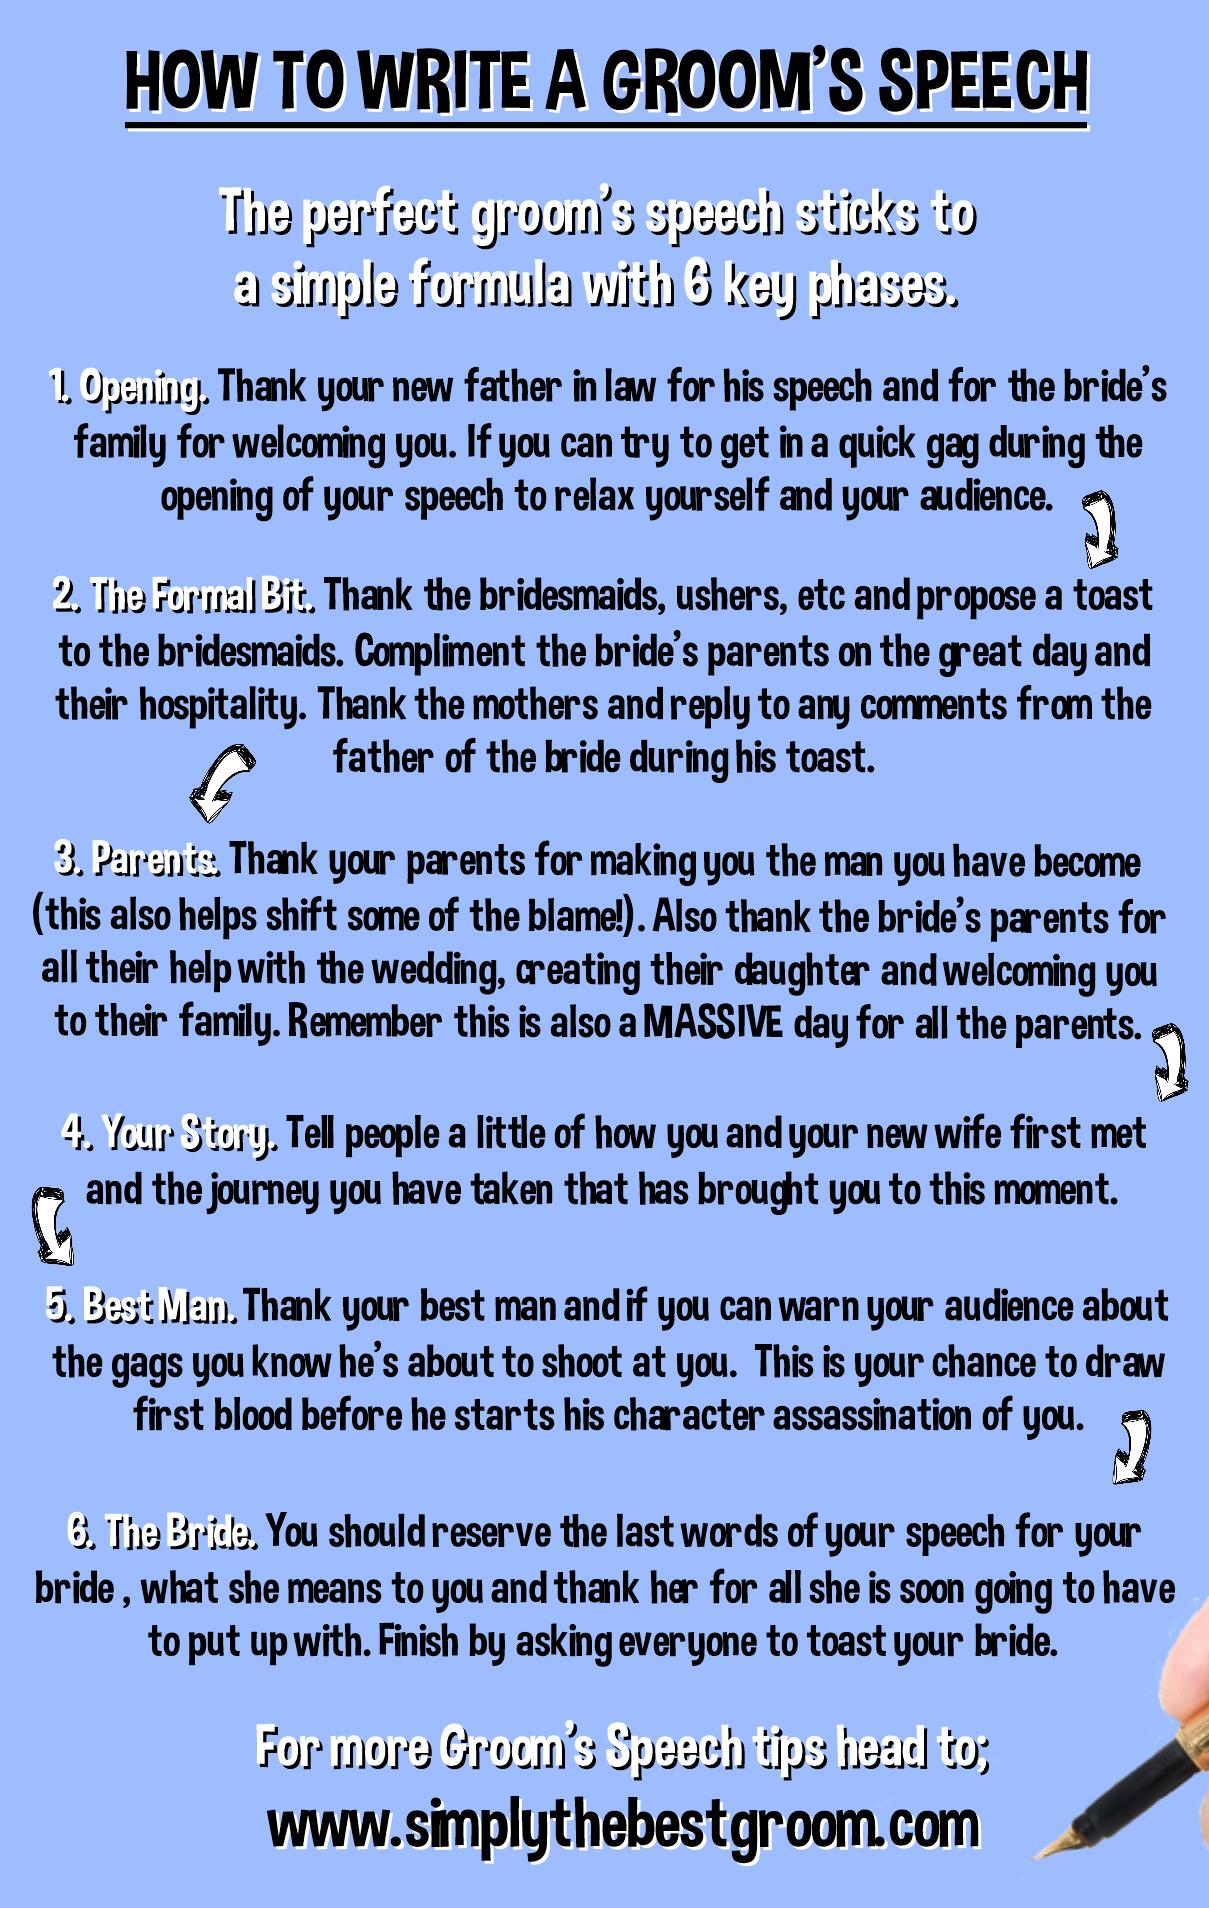 How to Write A Groom's Speech